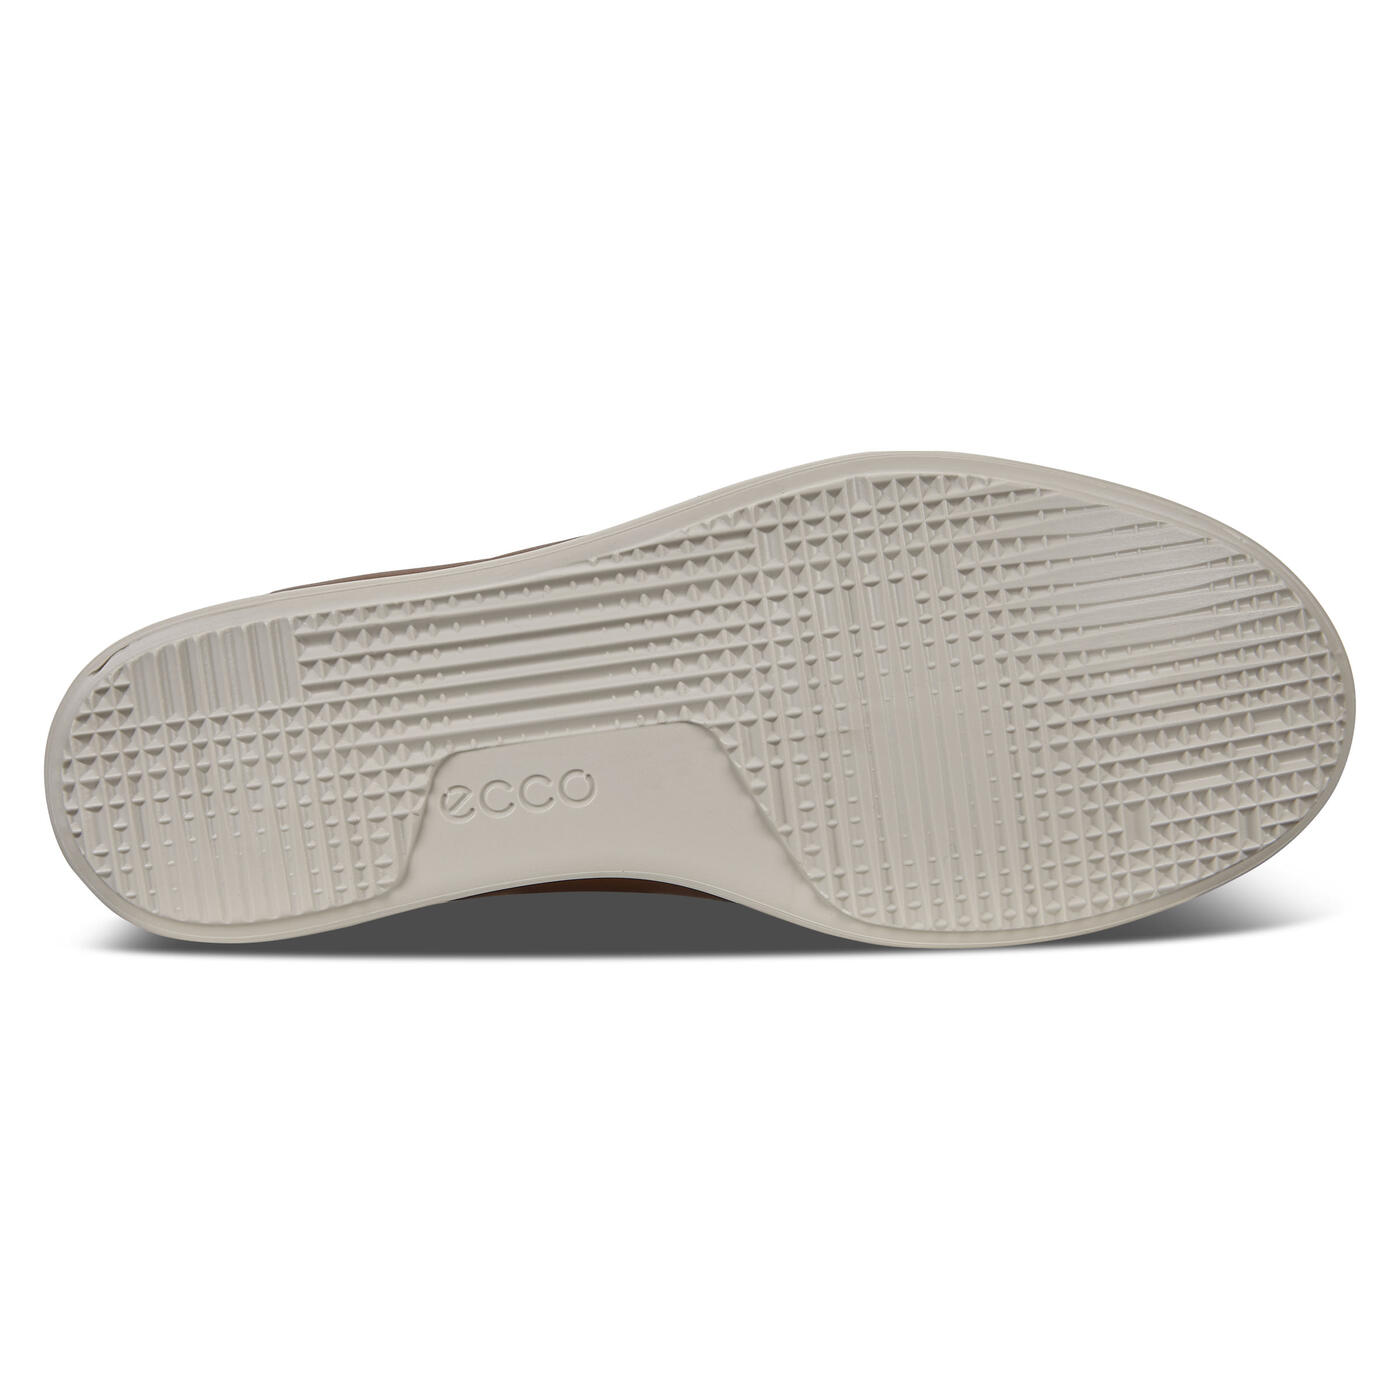 ECCO Collin 2.0 Men's Slip-On